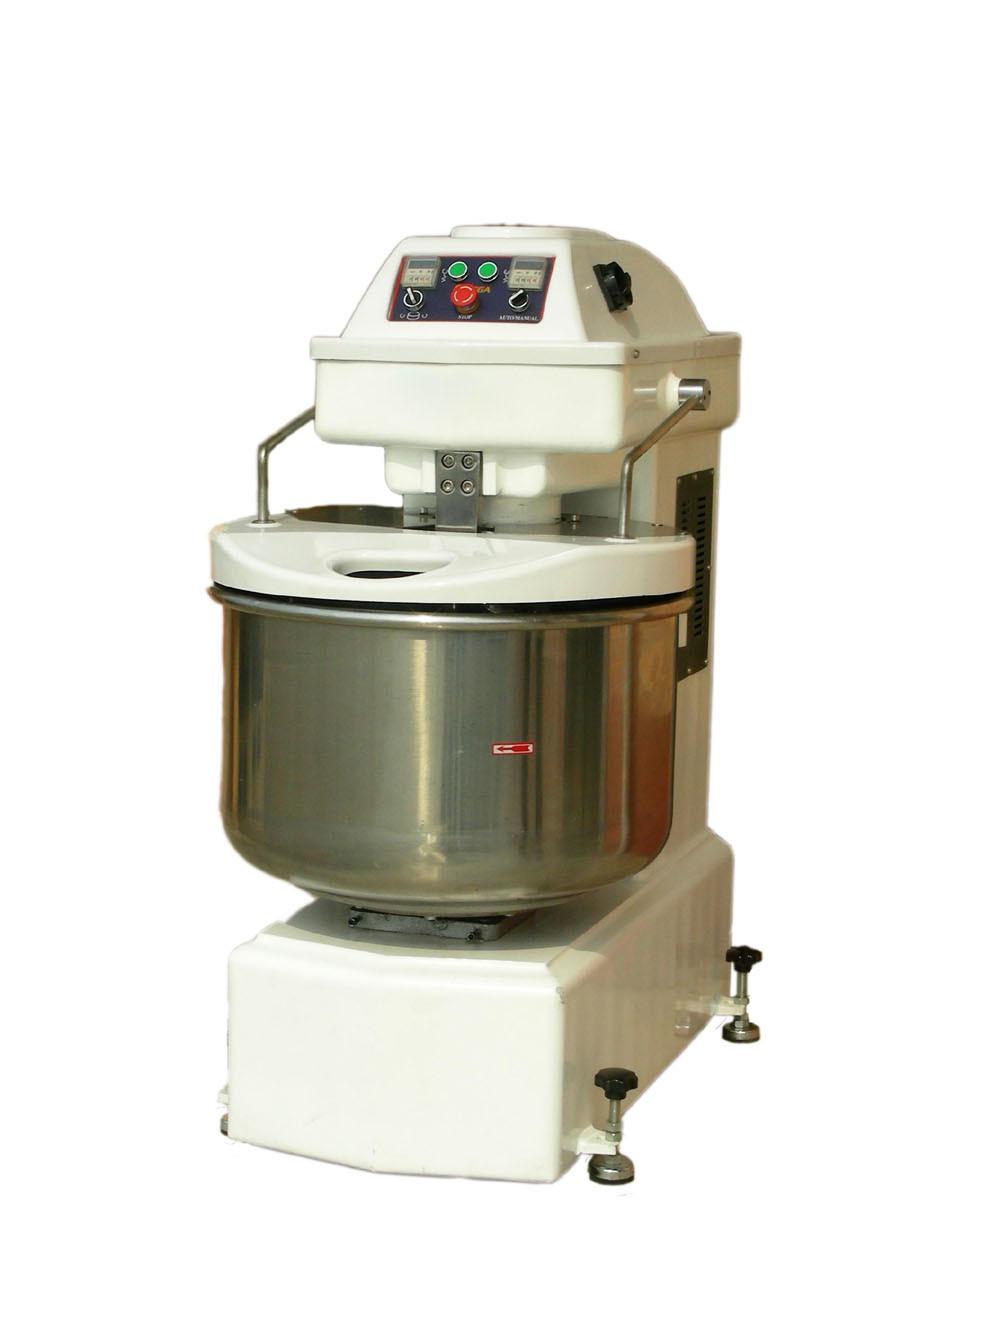 Bakery Product : Bakery Equipment